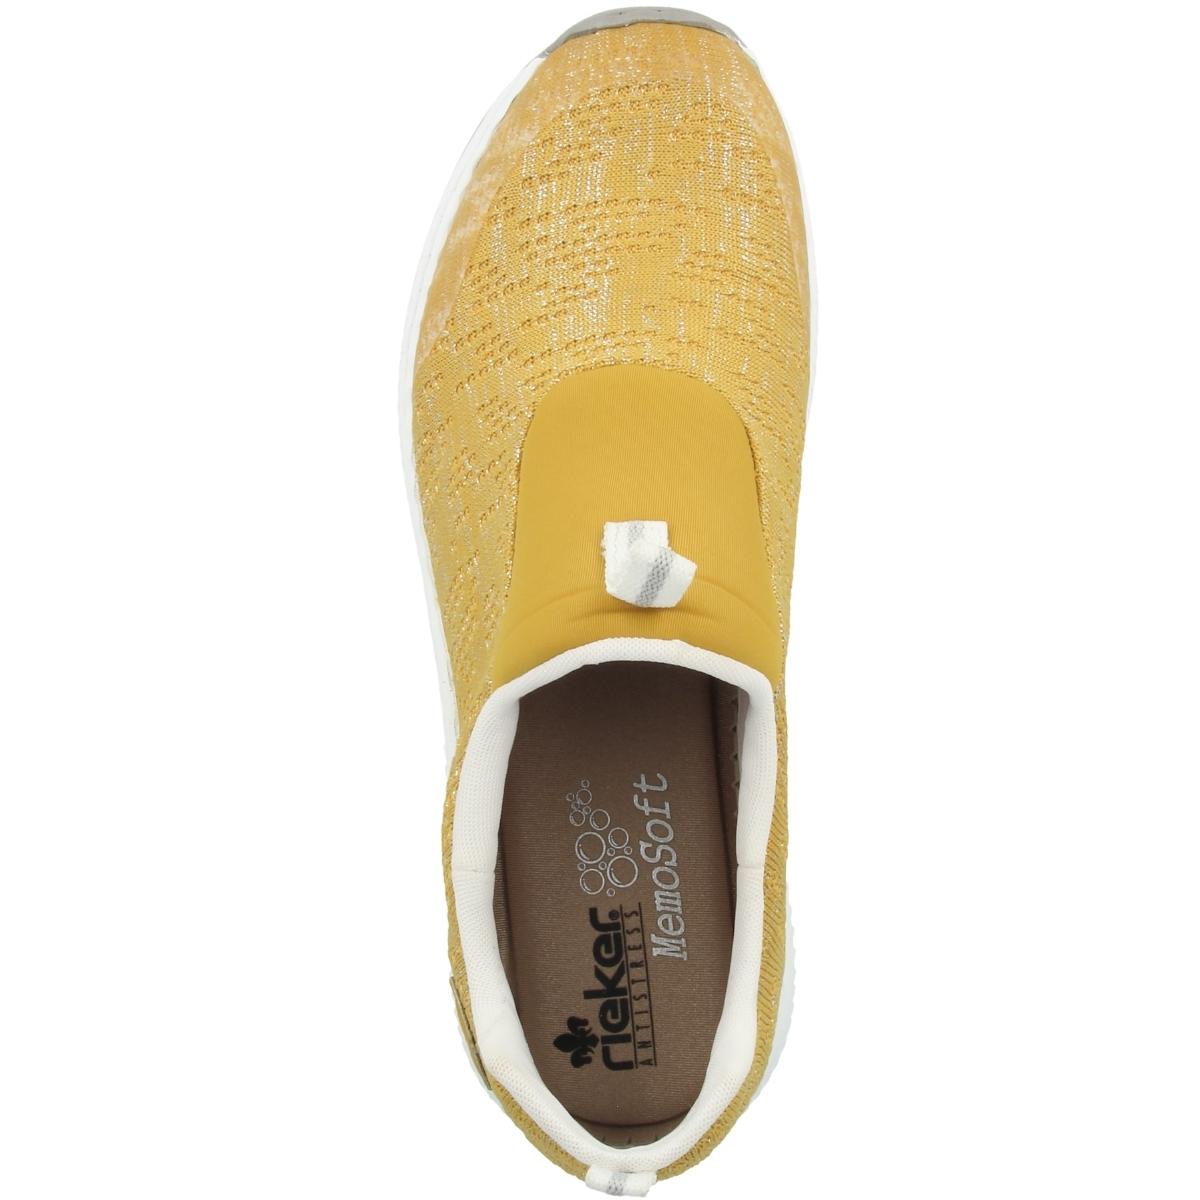 Rieker N5595 Damen Schuhe Slipper Halbschuhe, | real